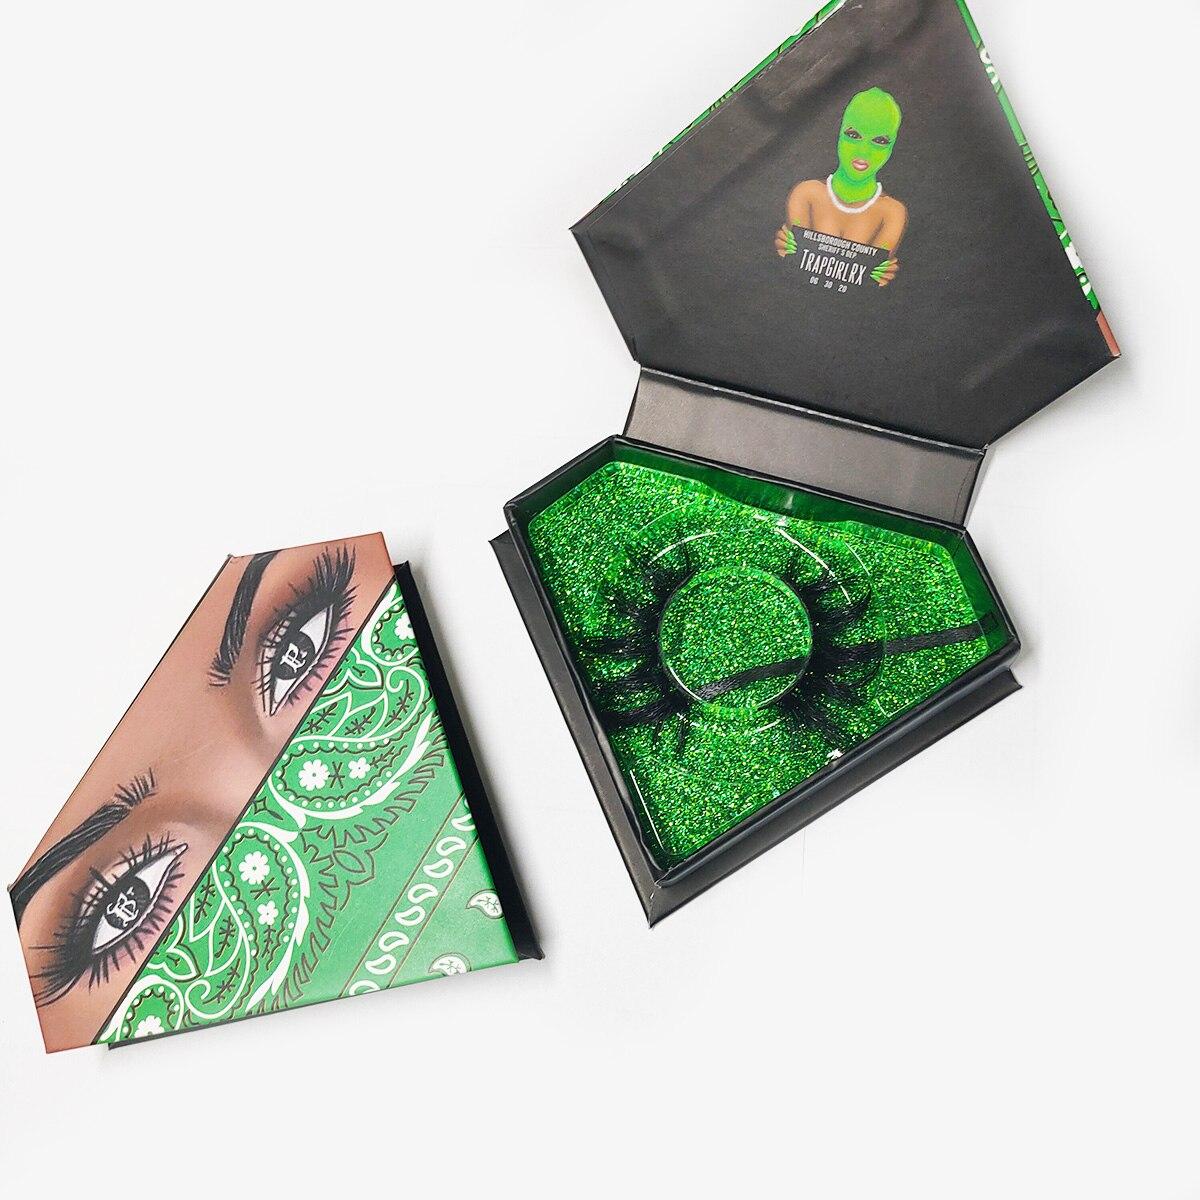 2020 New Green Diamond Mink Eyelashes Packaging Box Custom Mink Lashes Case 100PCS Private Label Free Transparent Lash Holder